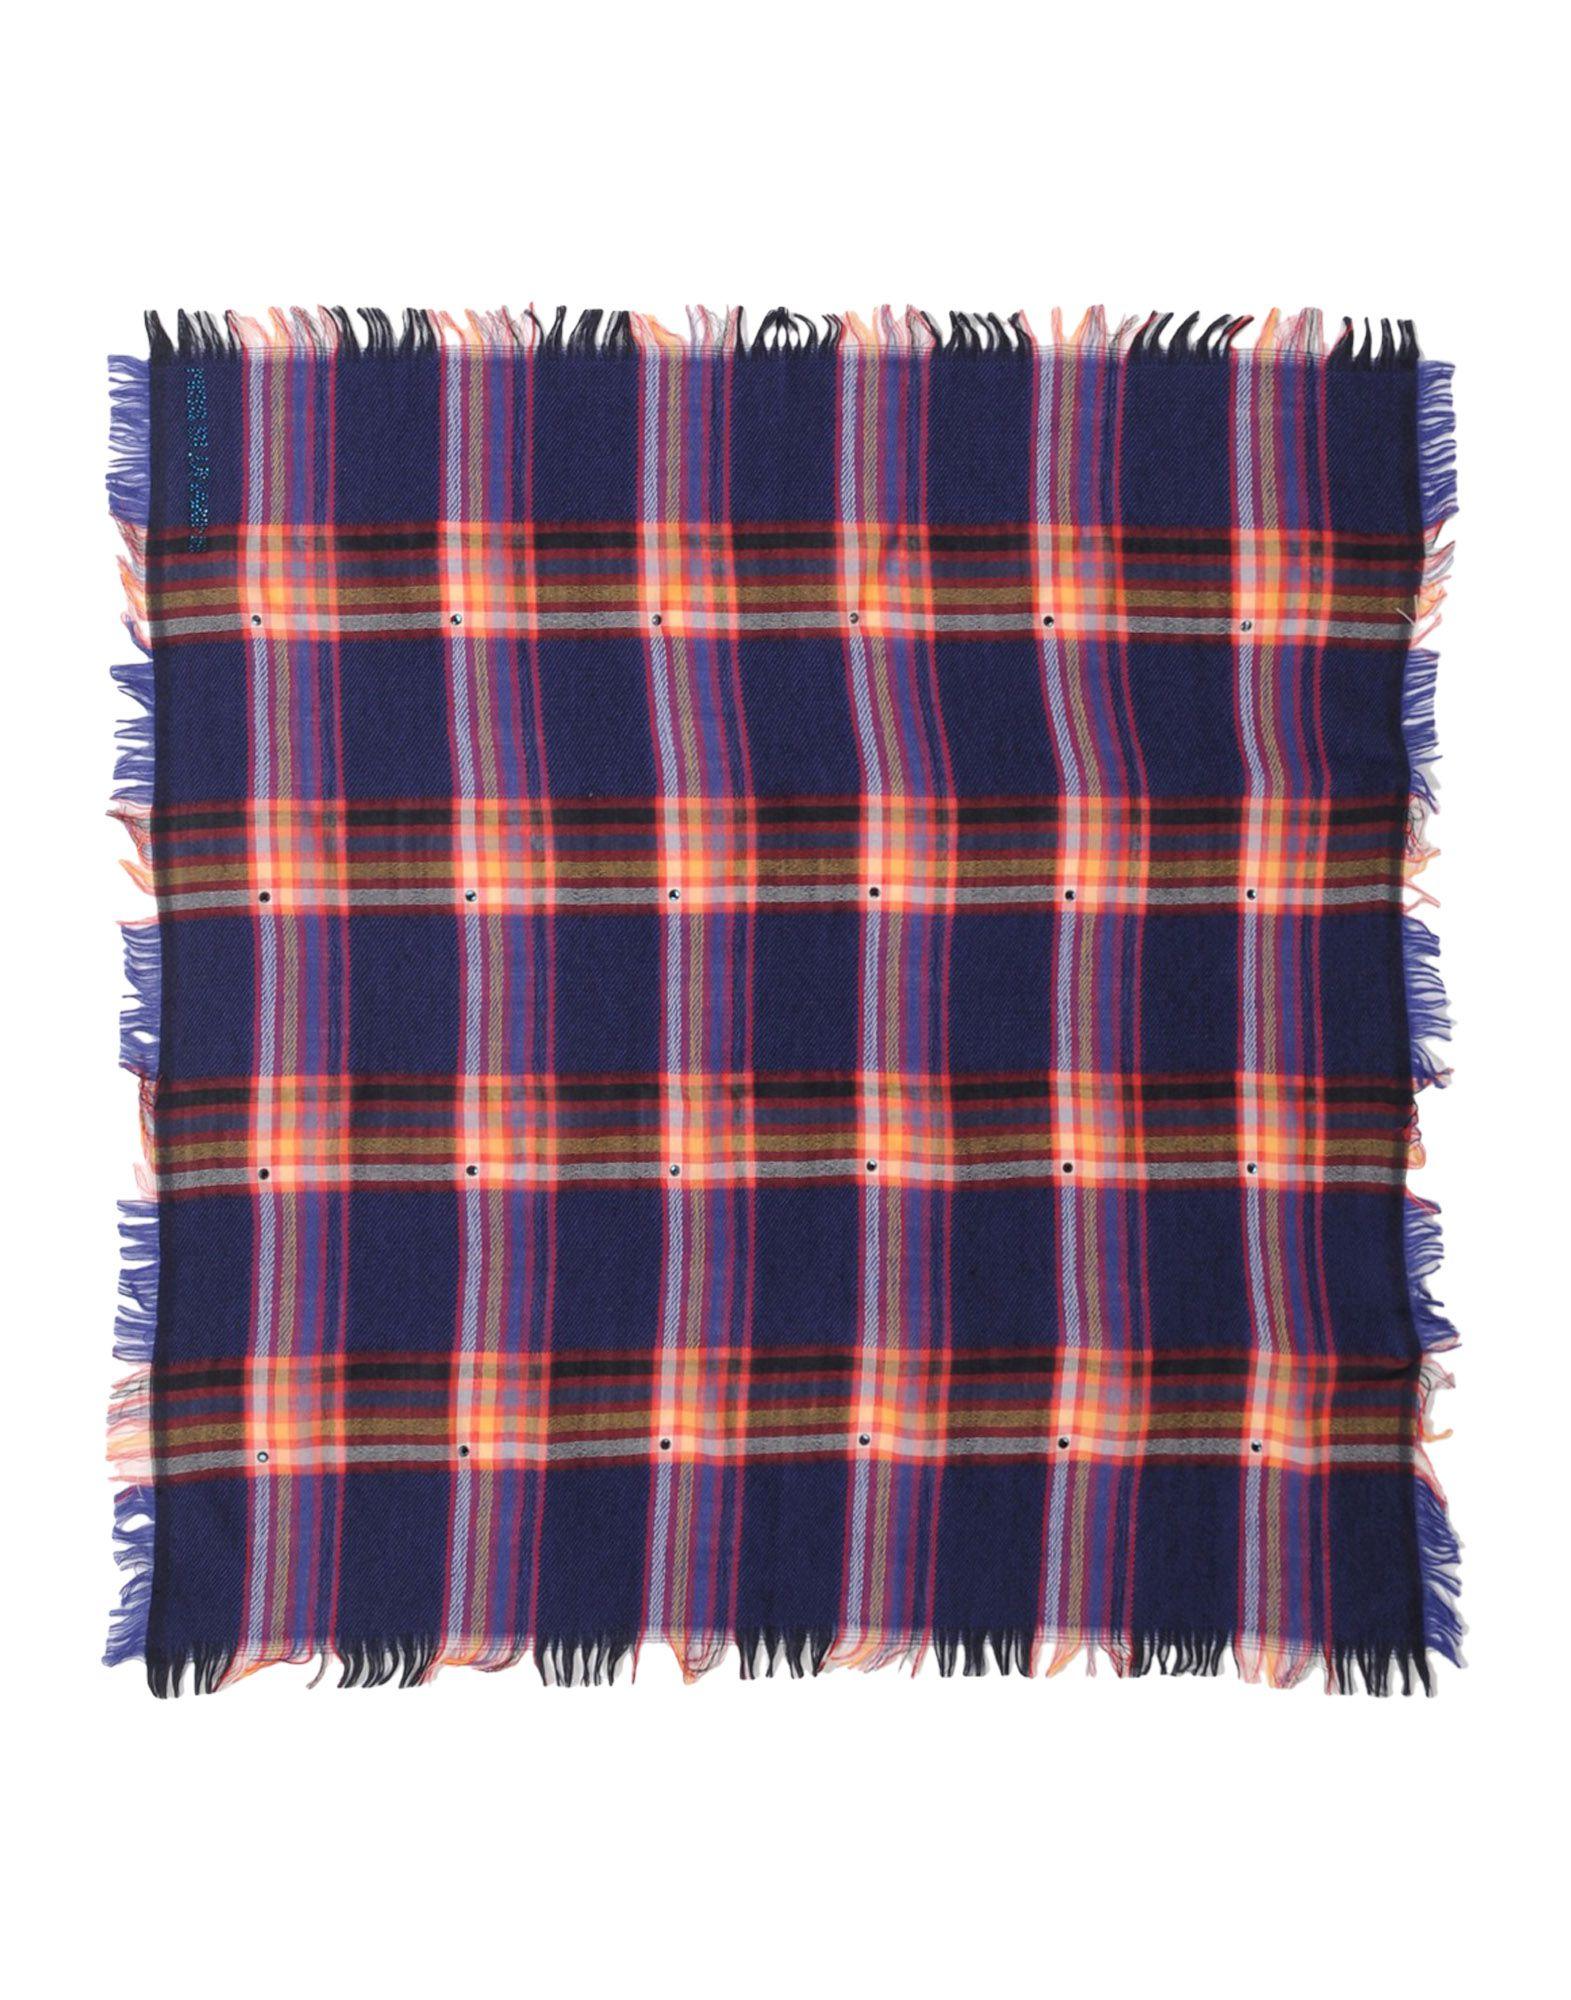 MISS BLUMARINE JEANS Square scarves